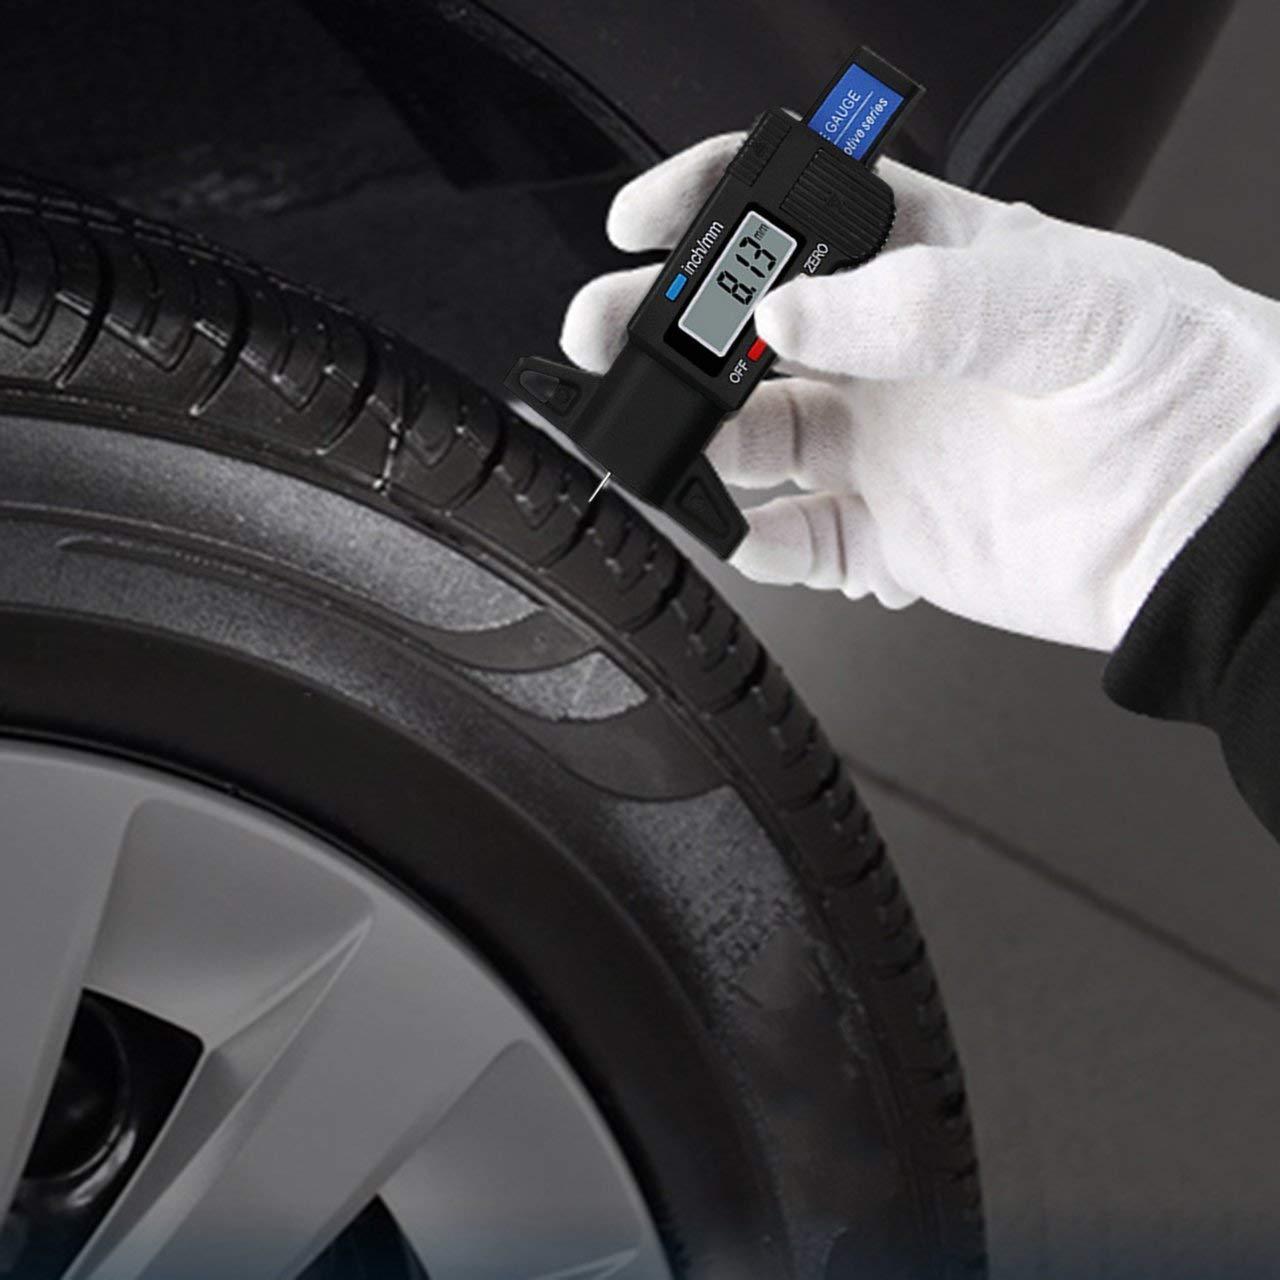 Jasnyfall Digital Car Tire Tread Depth Tester 0-25mm Tyre Tread Depth Gauge Meter black